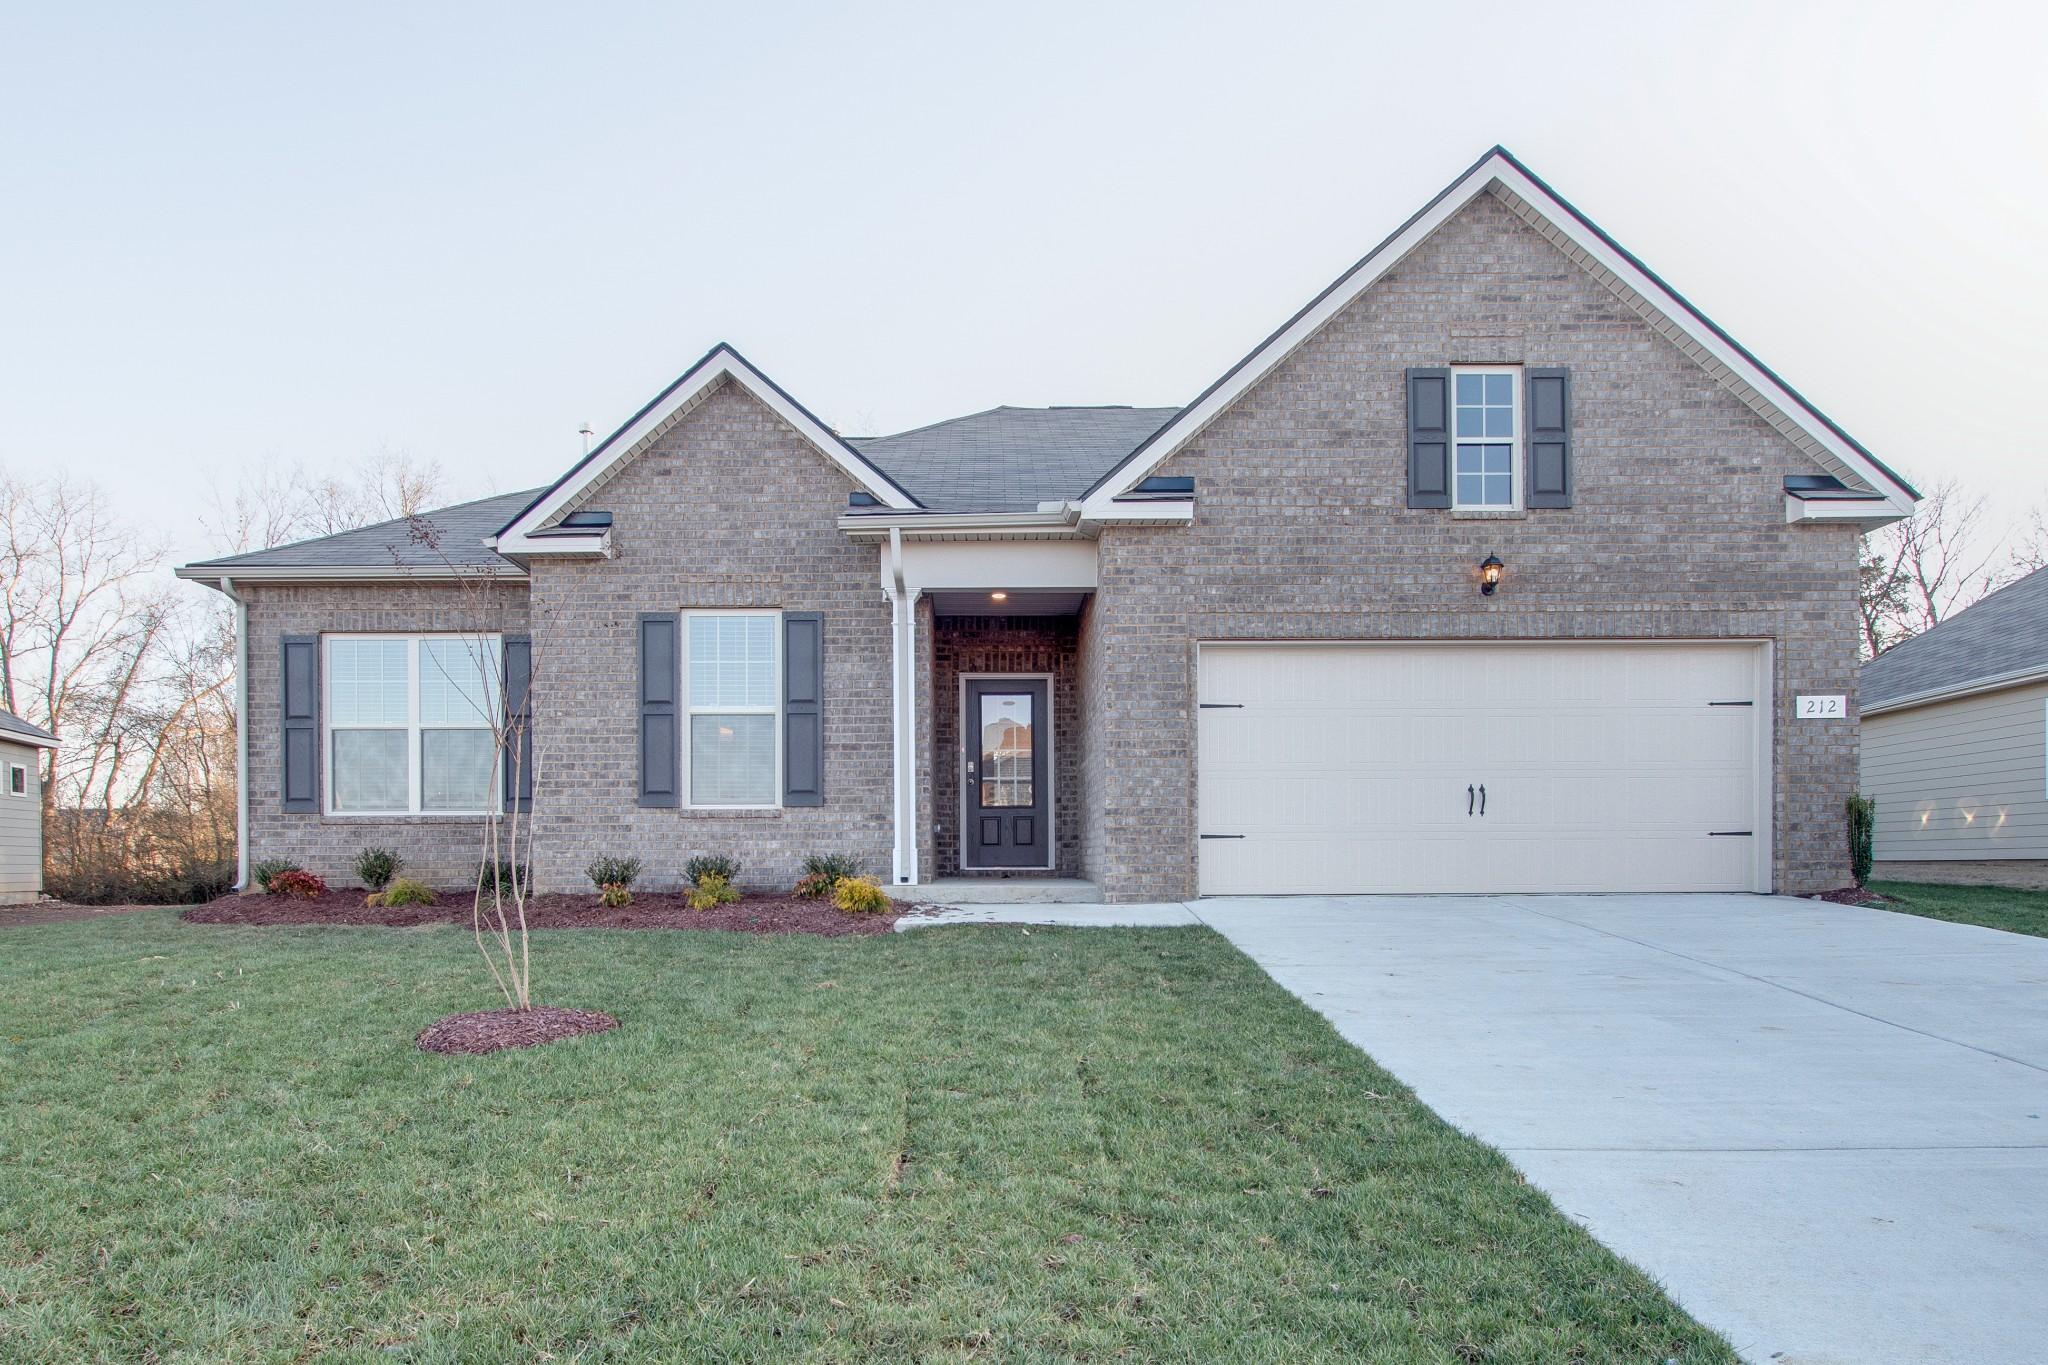 1013 Alta Vista Lane, #04 Property Photo - Smyrna, TN real estate listing